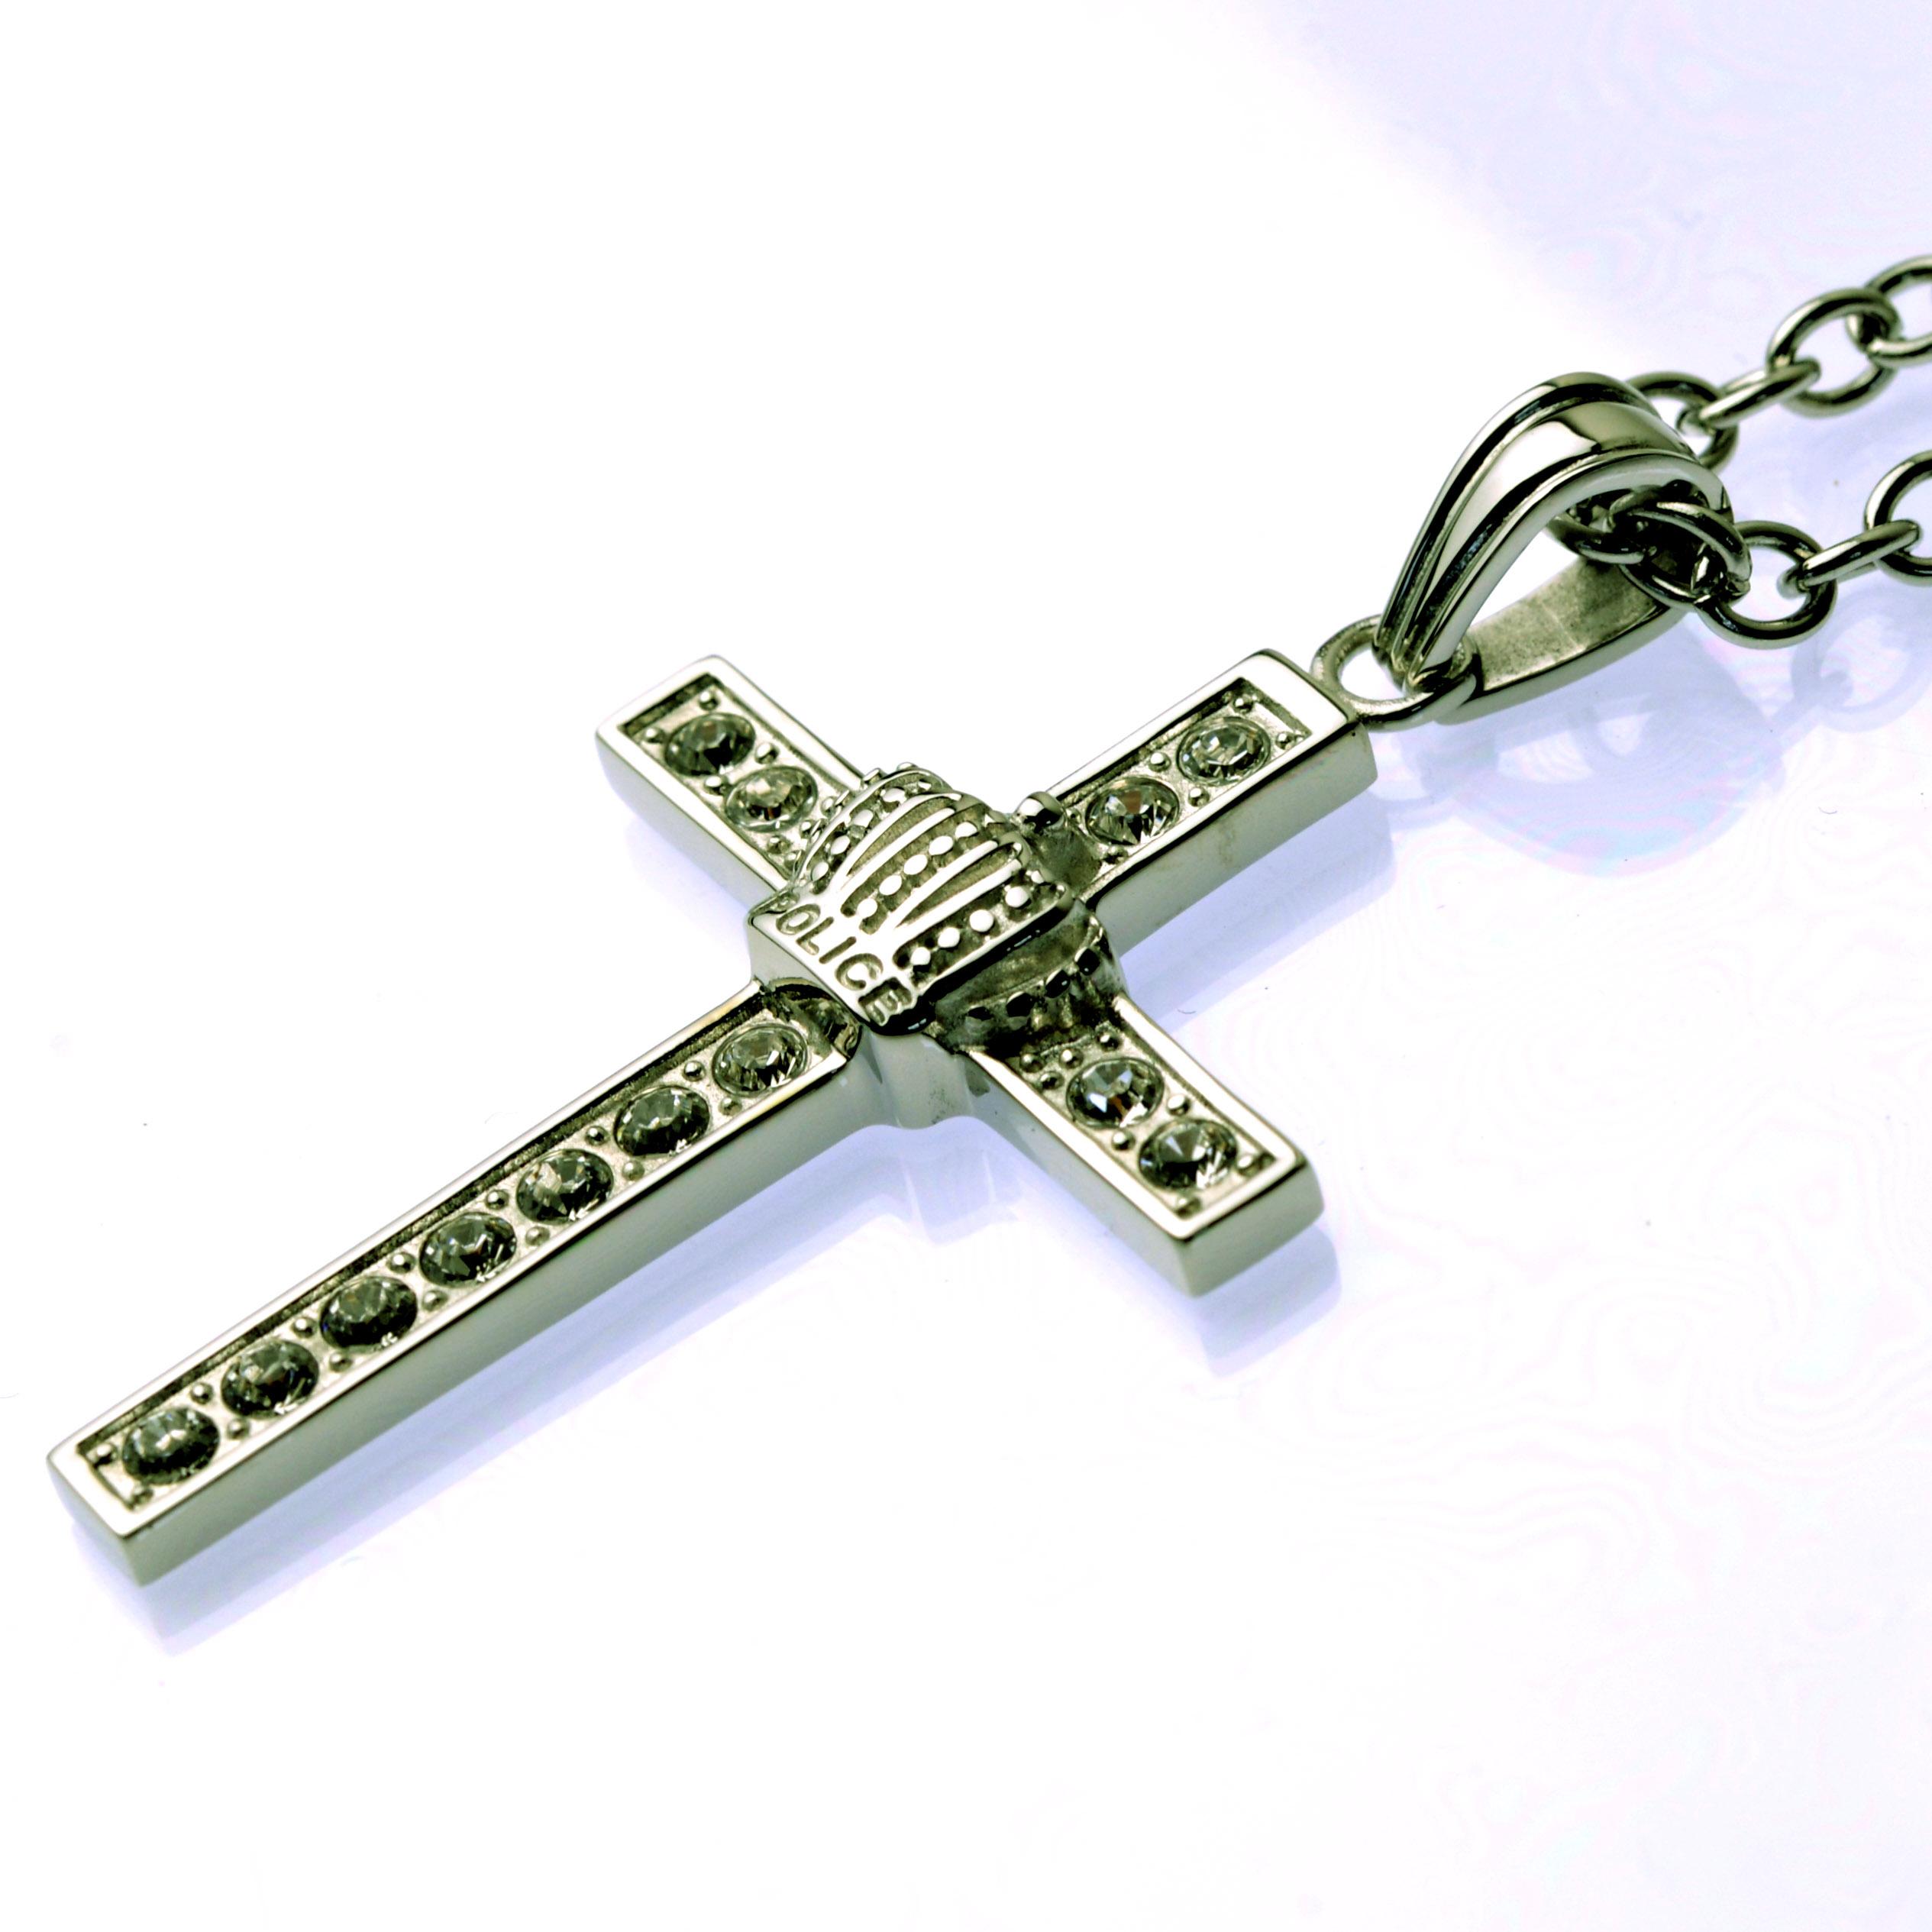 http://www.police.ne.jp/images/police__necklace_13.jpg